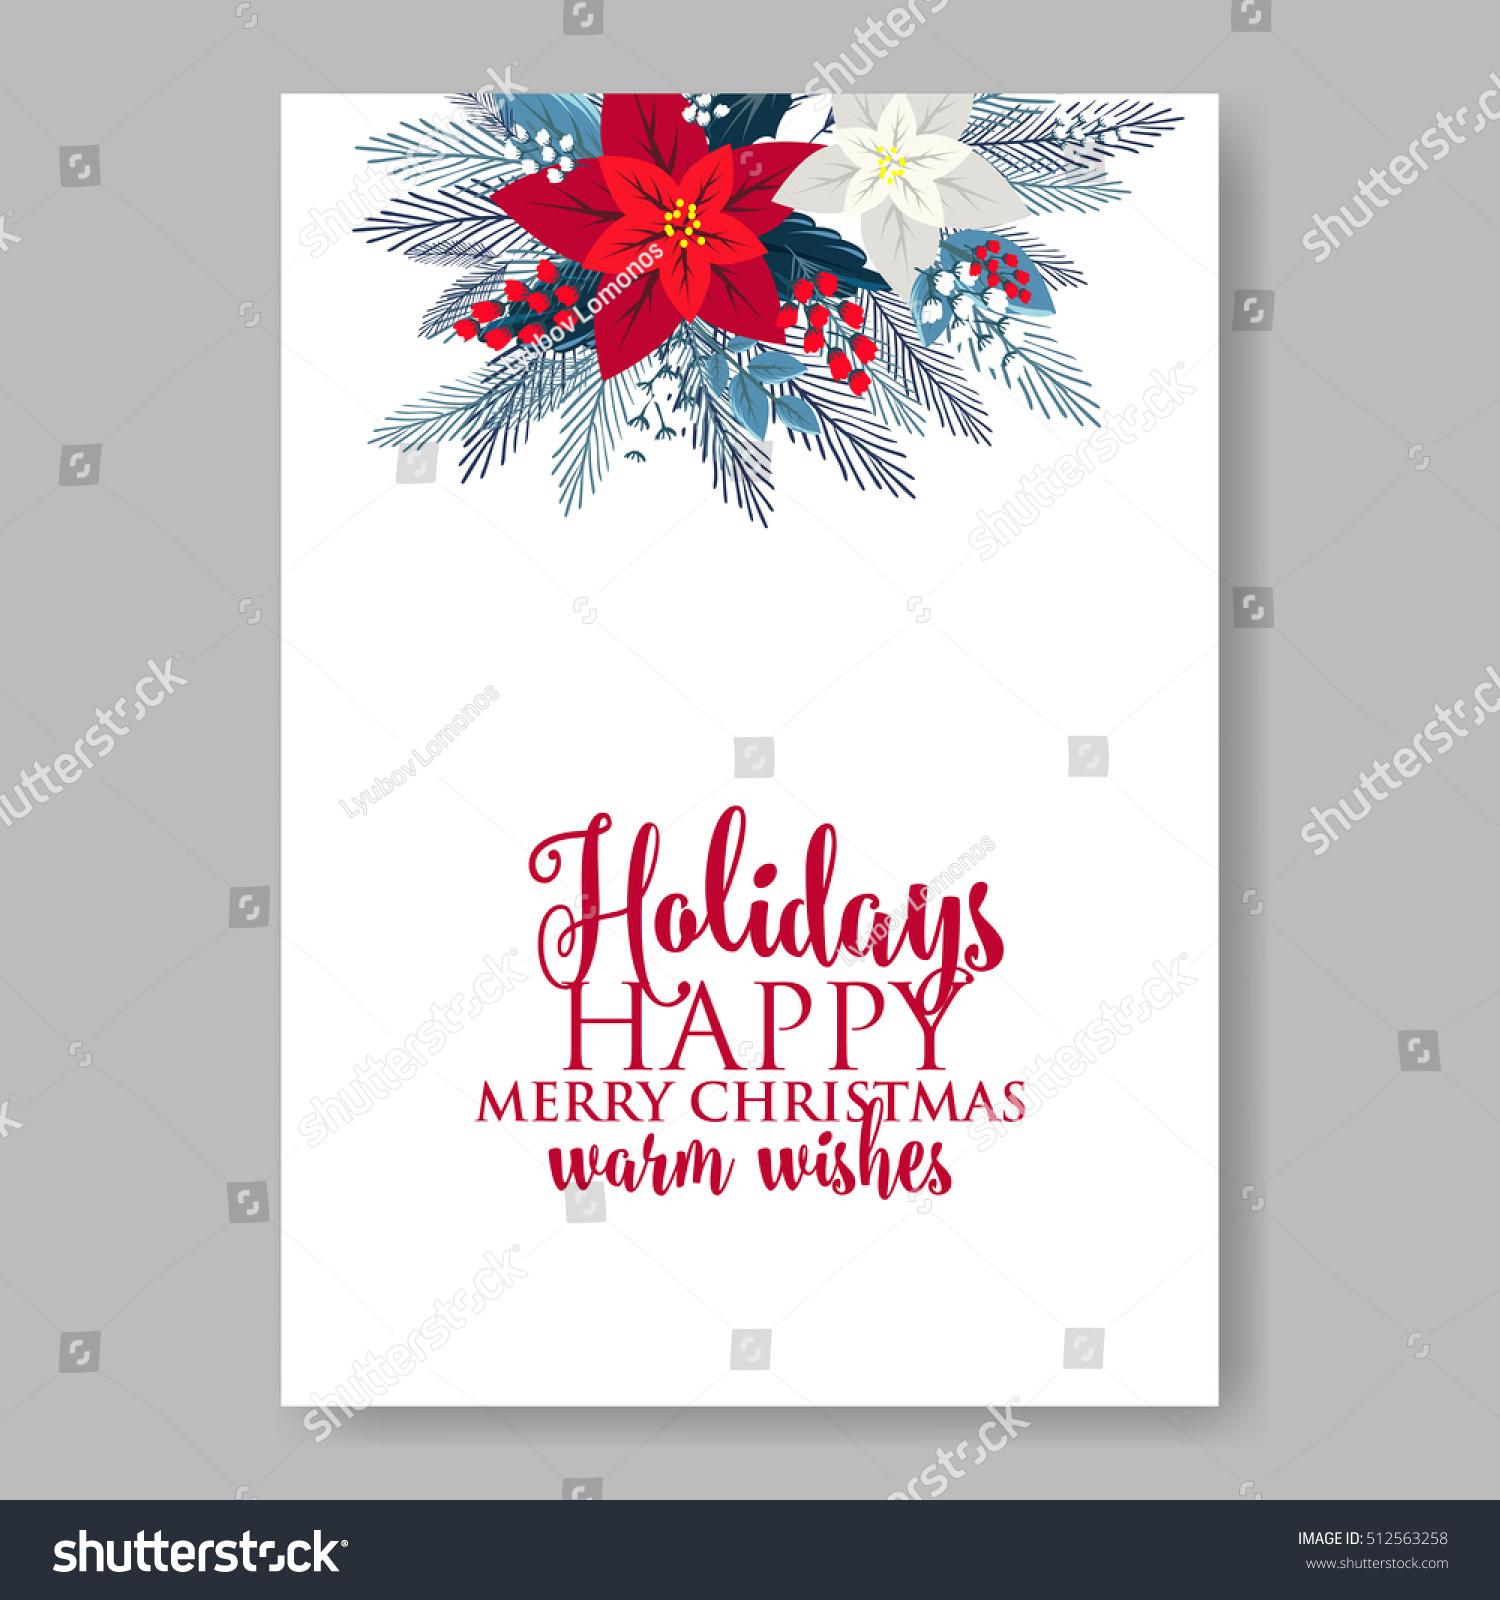 christmas party wreath poinsettia pine branch fir tree needle flower bouquet bridal shower